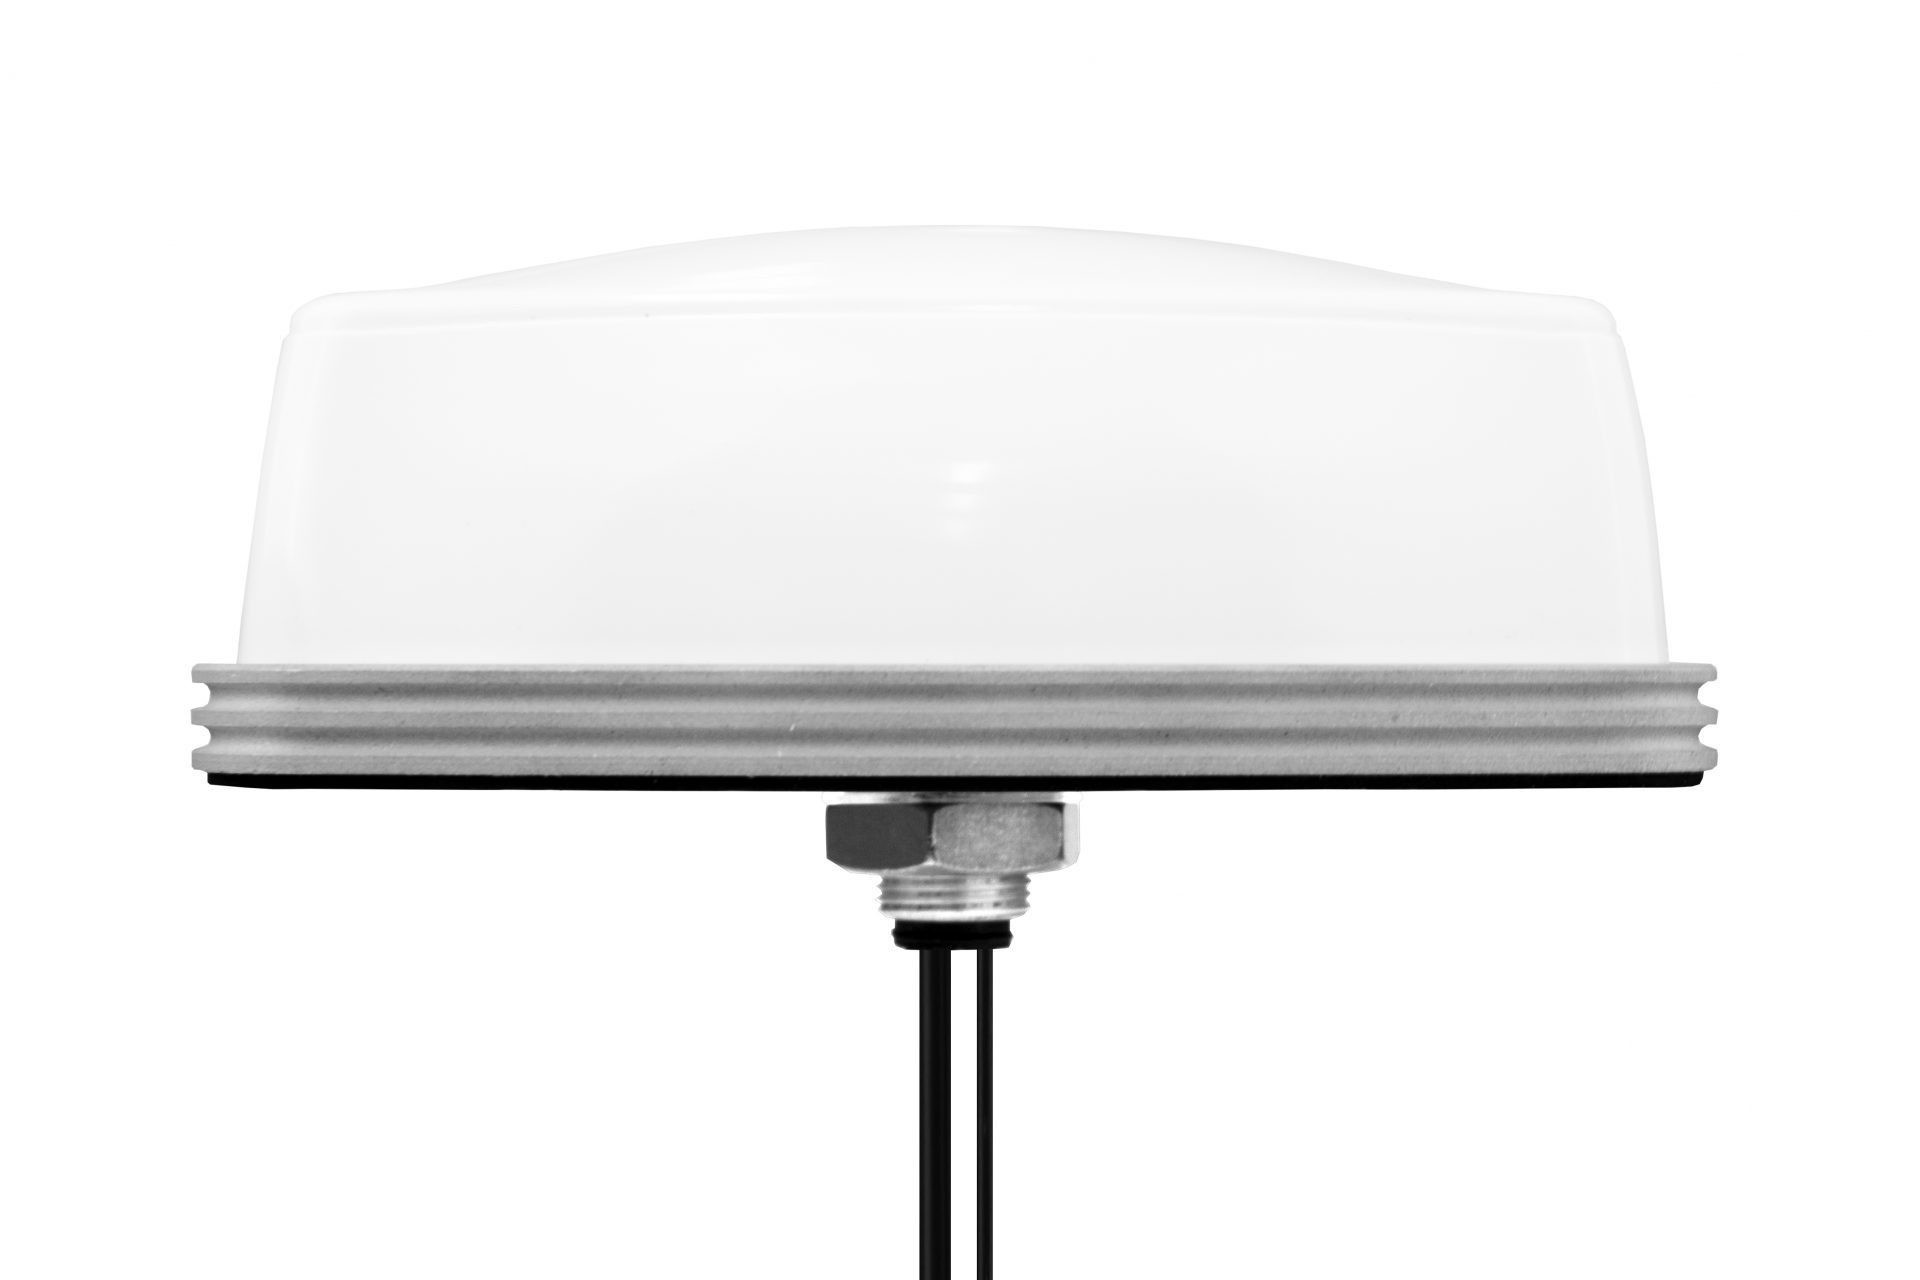 ZRM500 High Performance Rugged Mobile Smart Antenna Platform